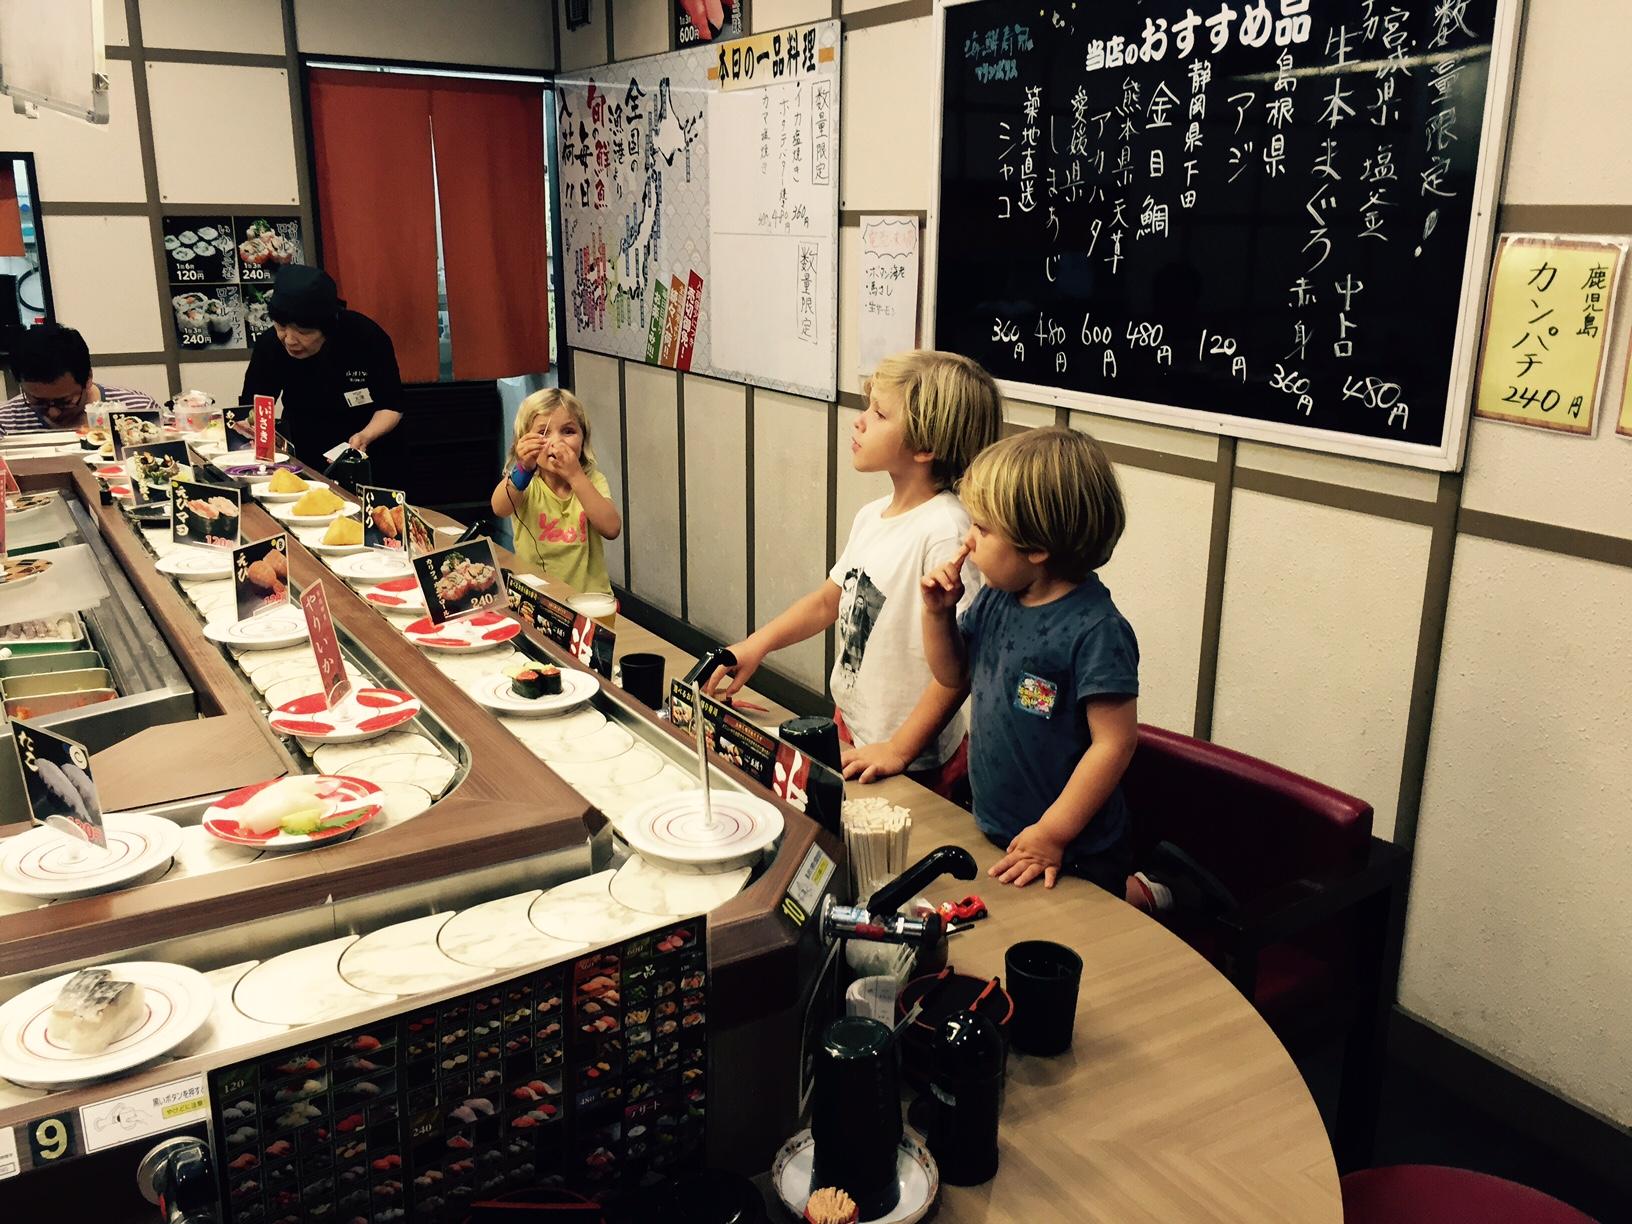 plateau-tournant-sushis2